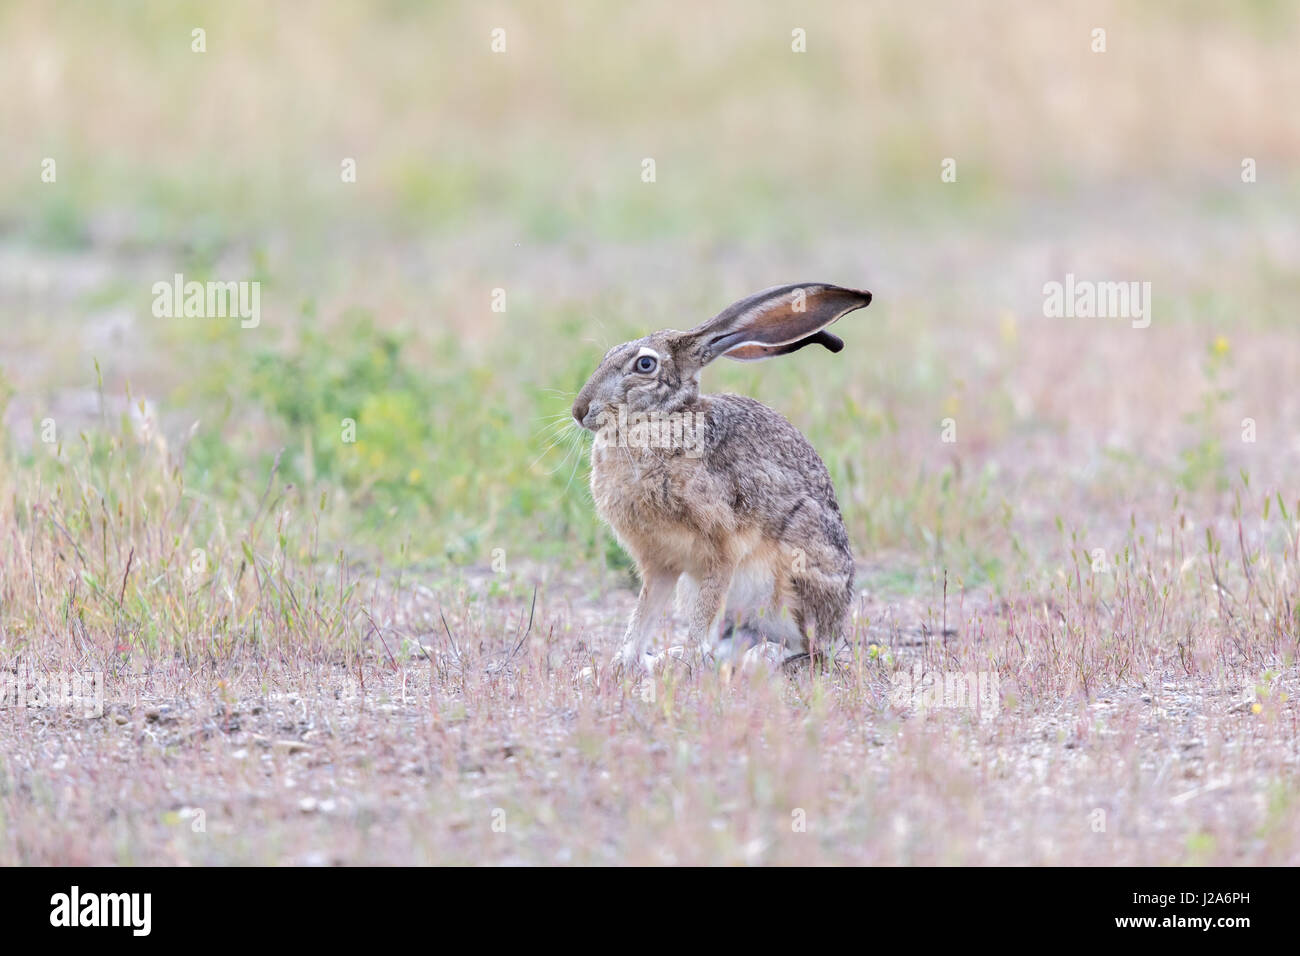 Alert Black-tailed Jackrabbit (Lepus californicus). - Stock Image